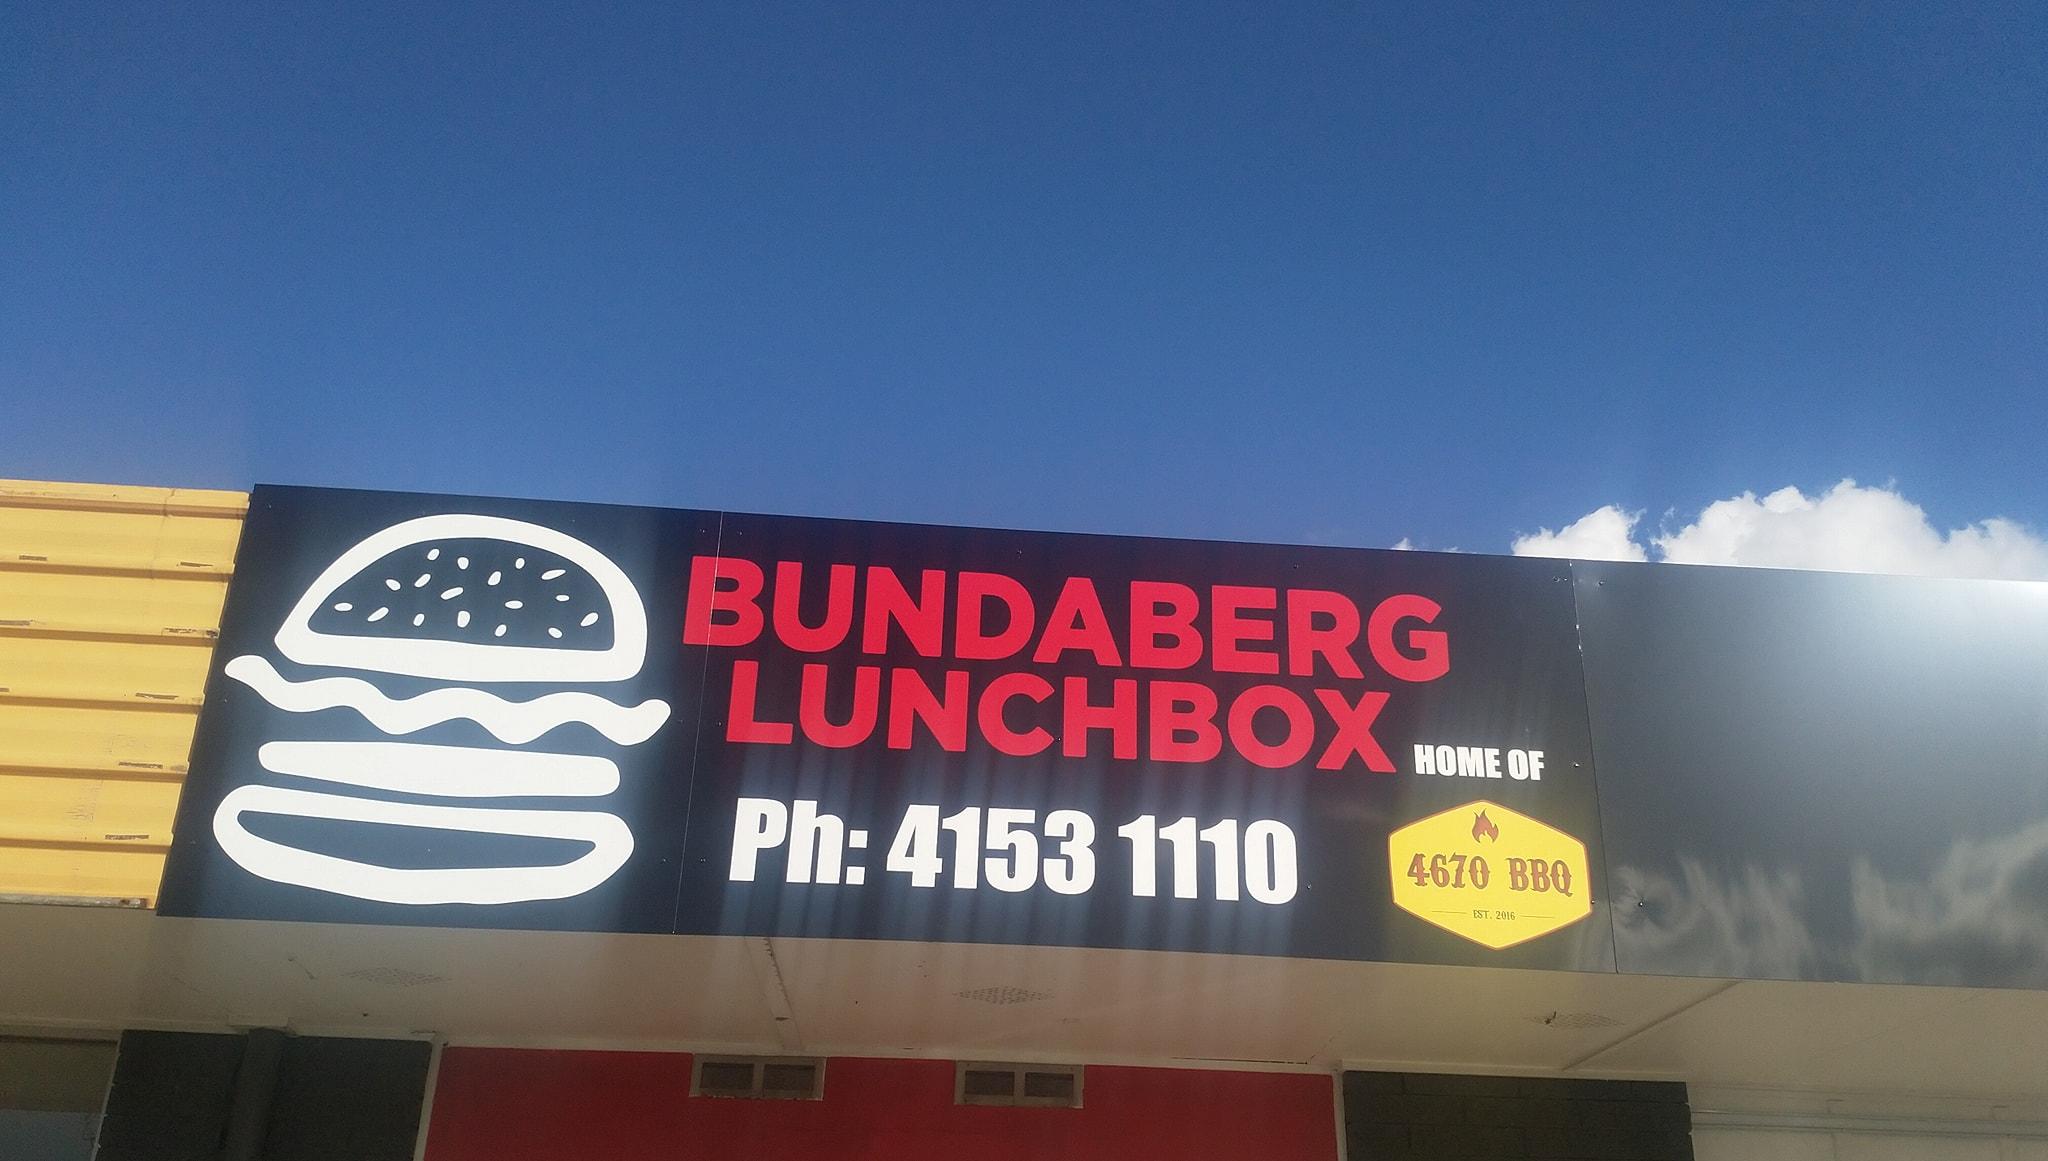 Bundaberg Lunchbox